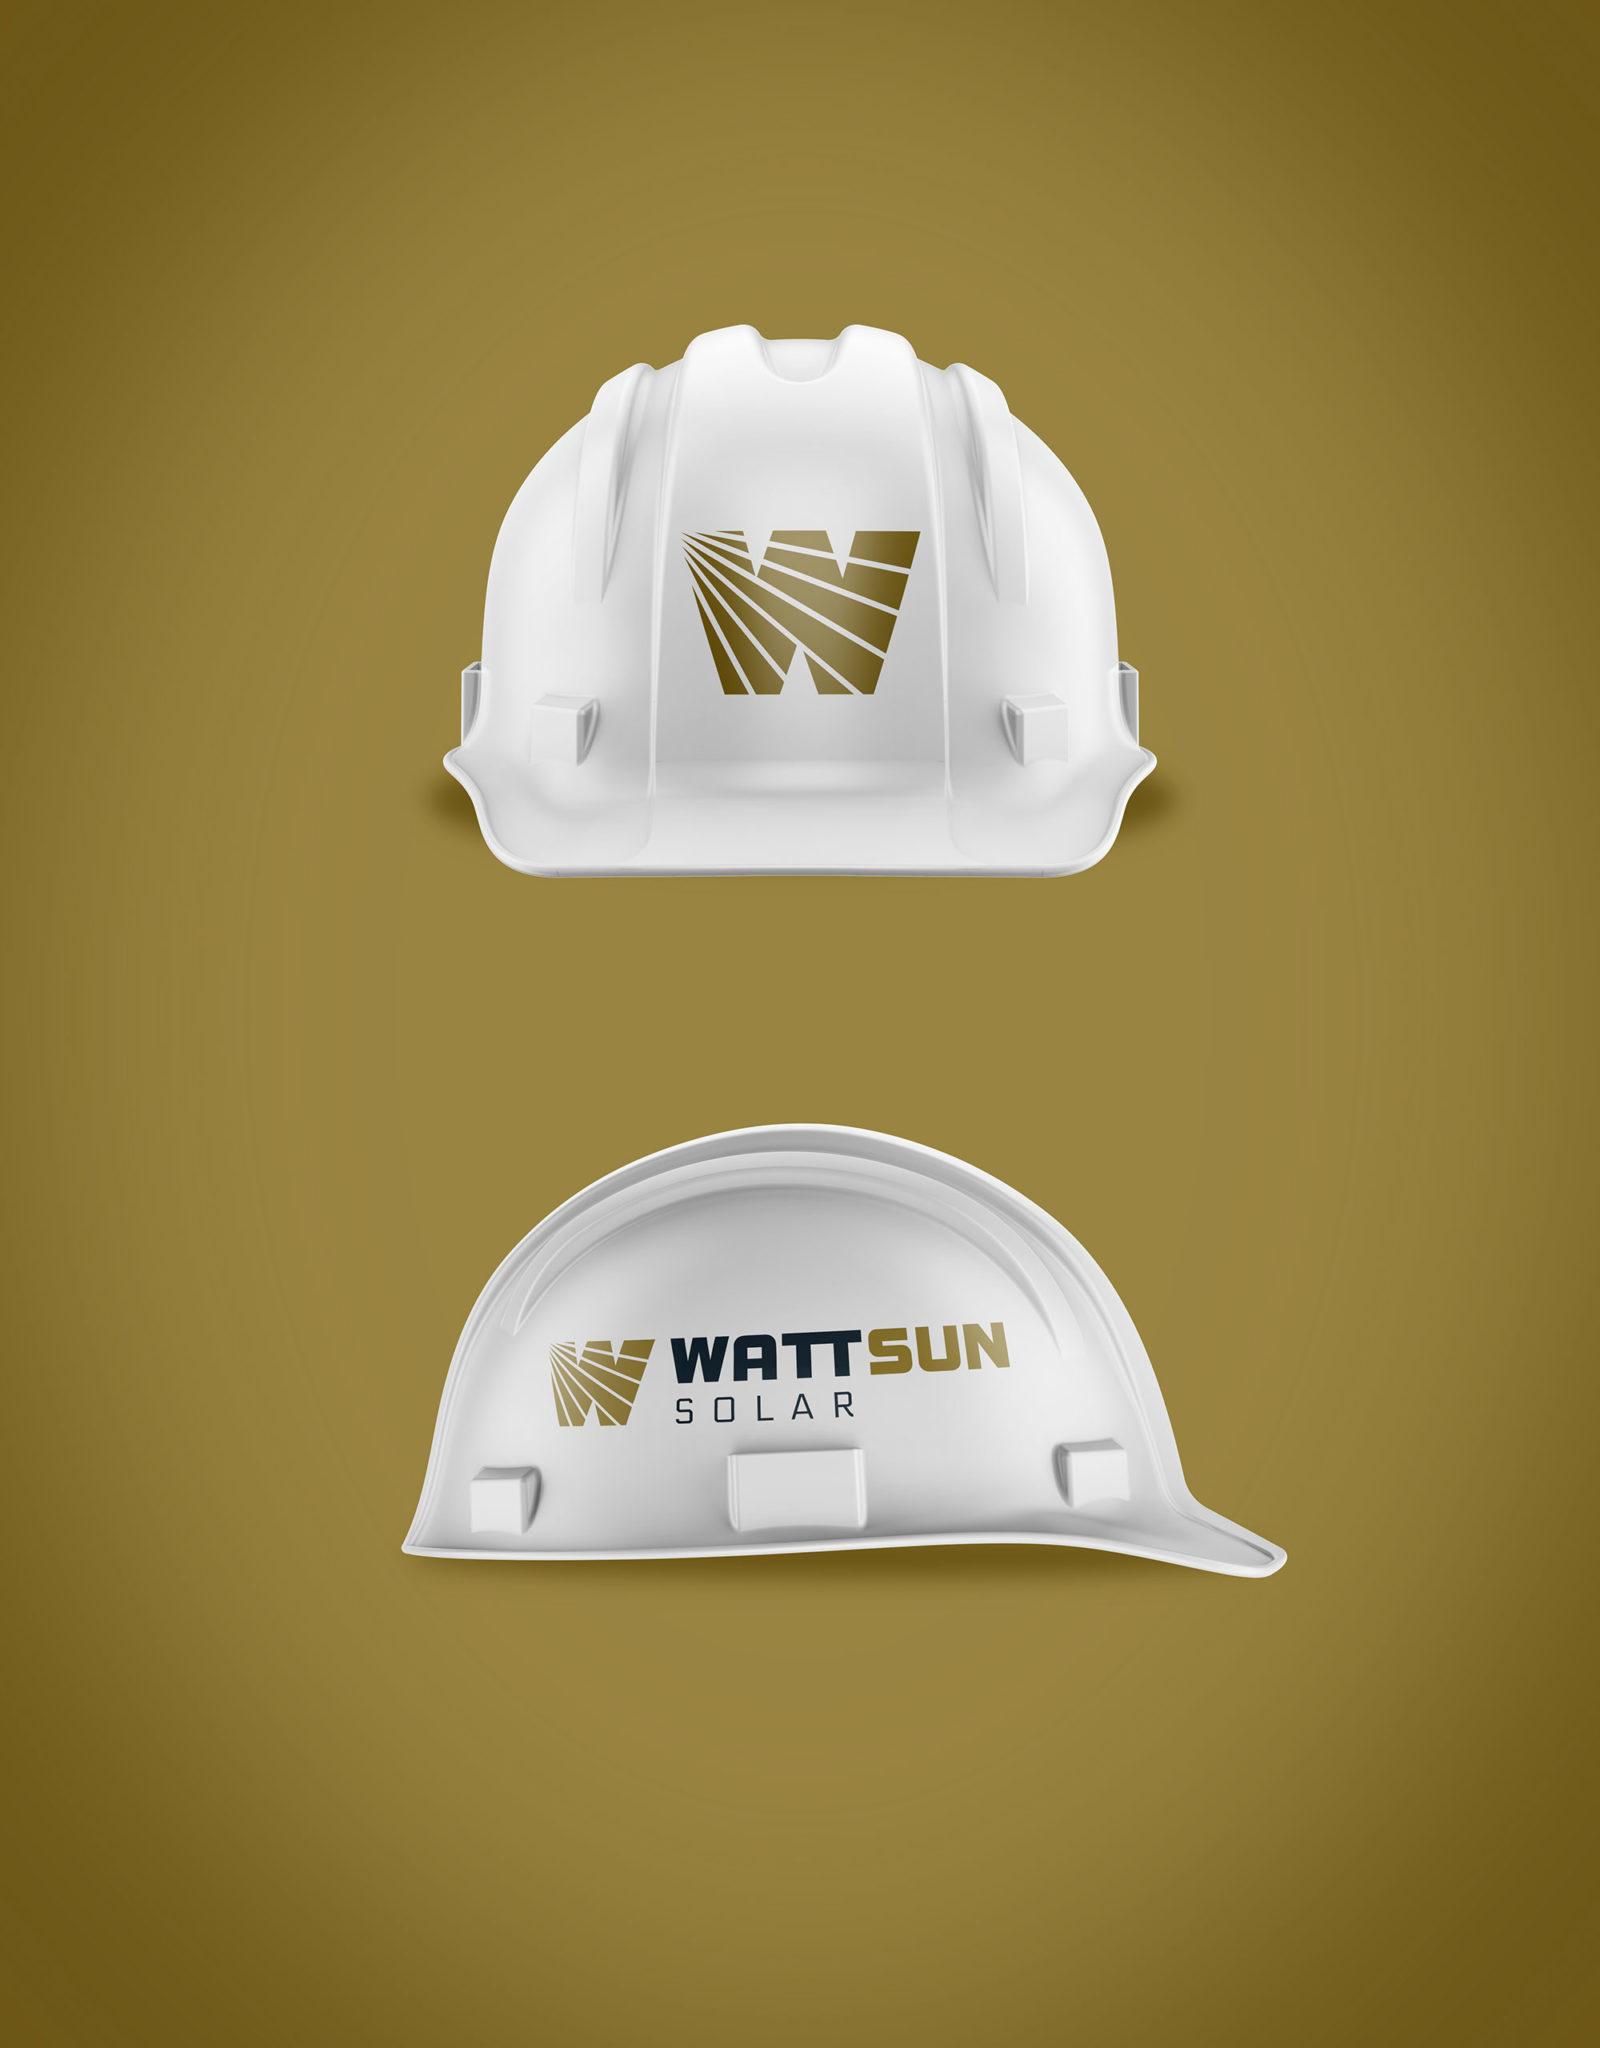 Wattsun hardhat design